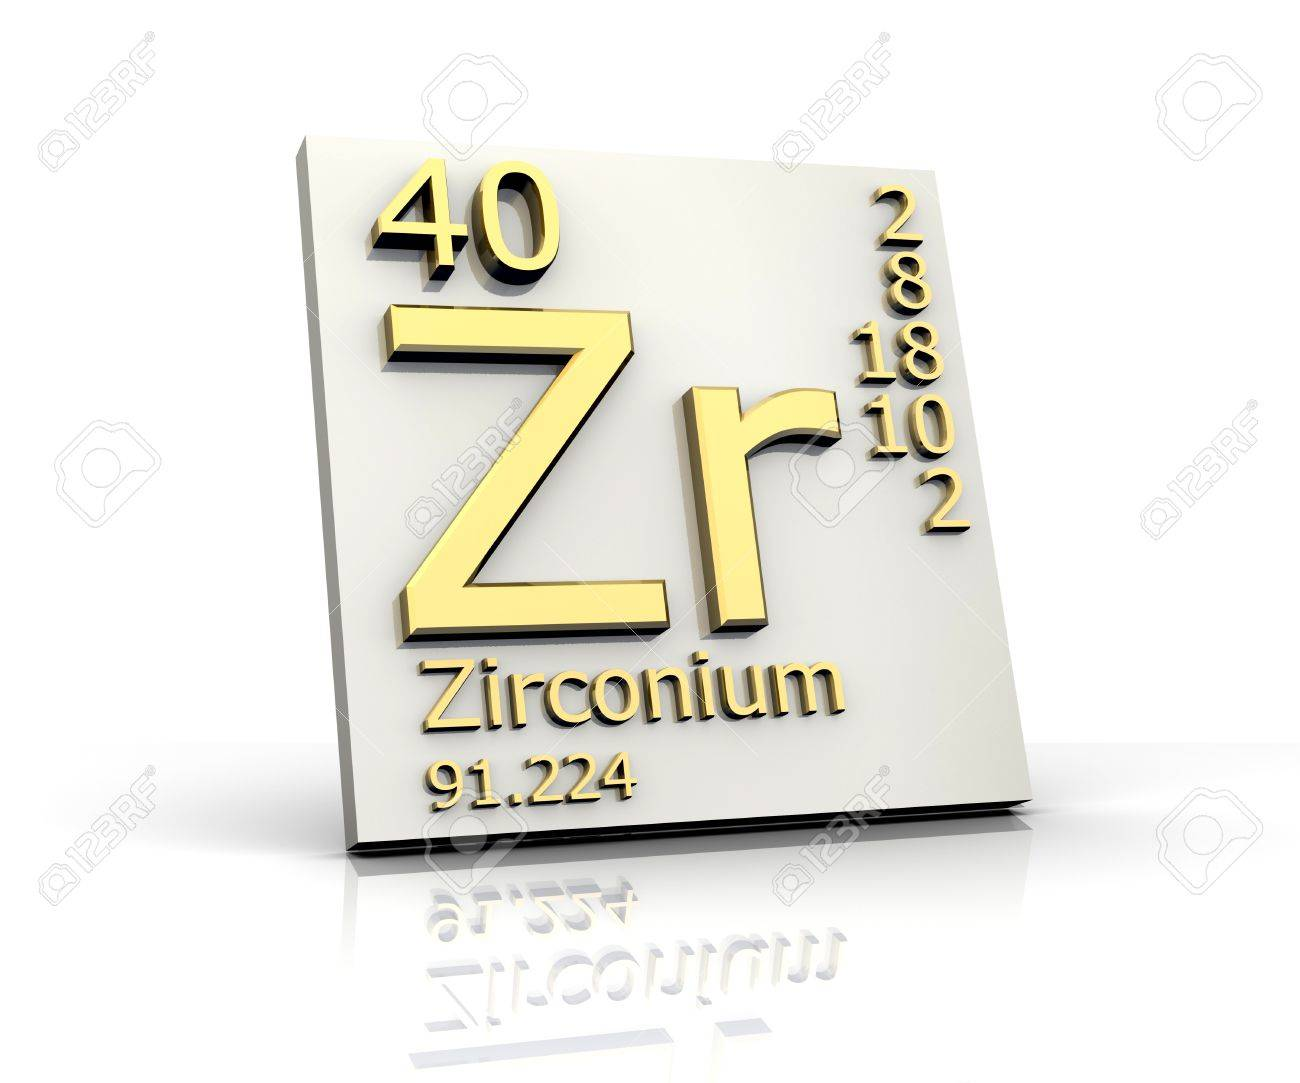 Periodic table zirconium gallery periodic table images zirconium symbol periodic table gallery periodic table images zirconium form periodic table of elements stock photo gamestrikefo Images